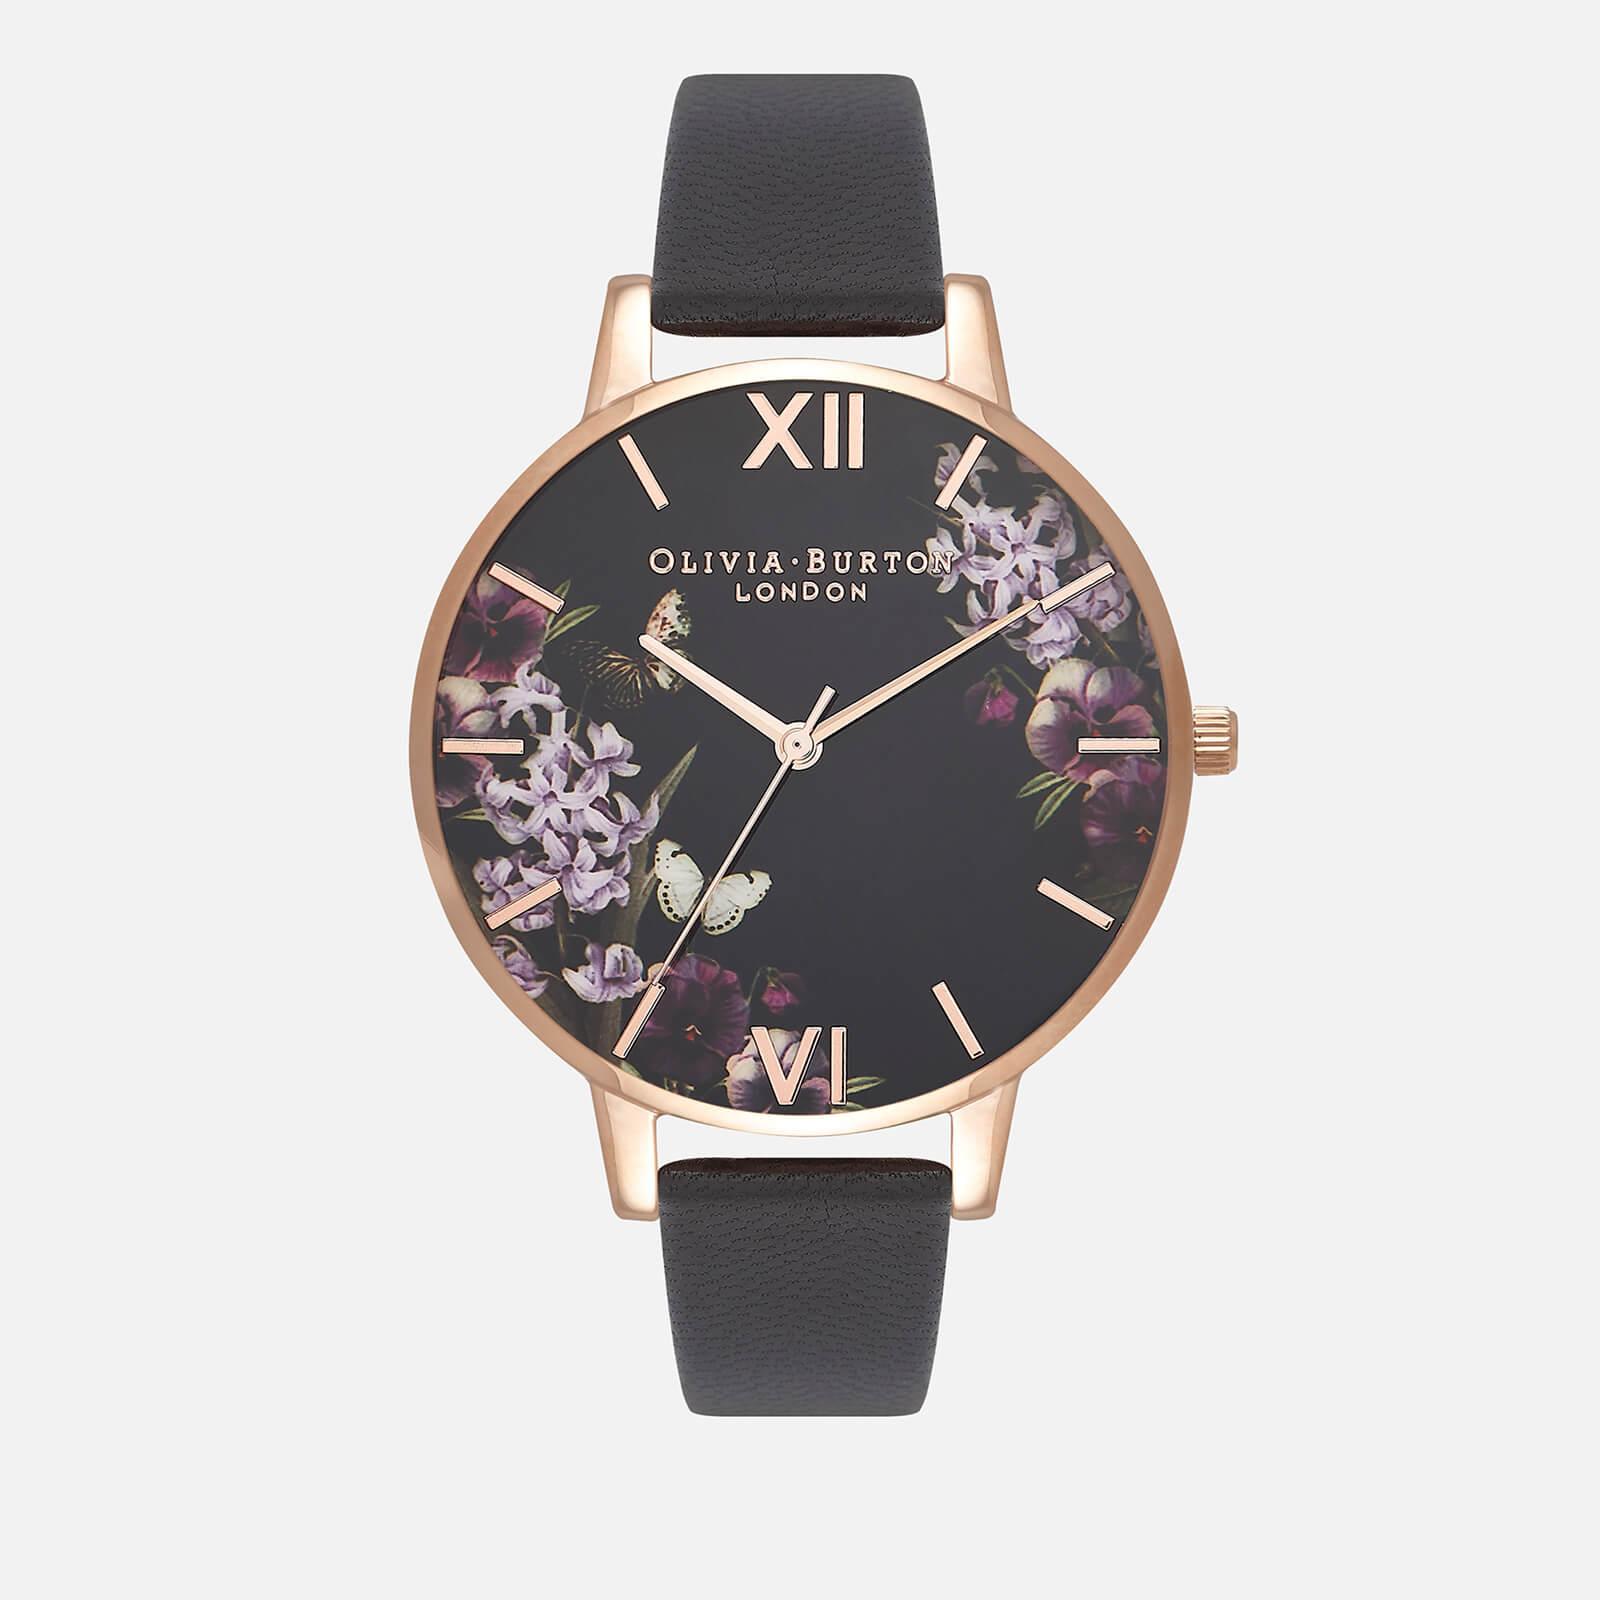 Olivia Burton Women's Enchanted Garden UK Exclusive Watch - Black/Rose Gold